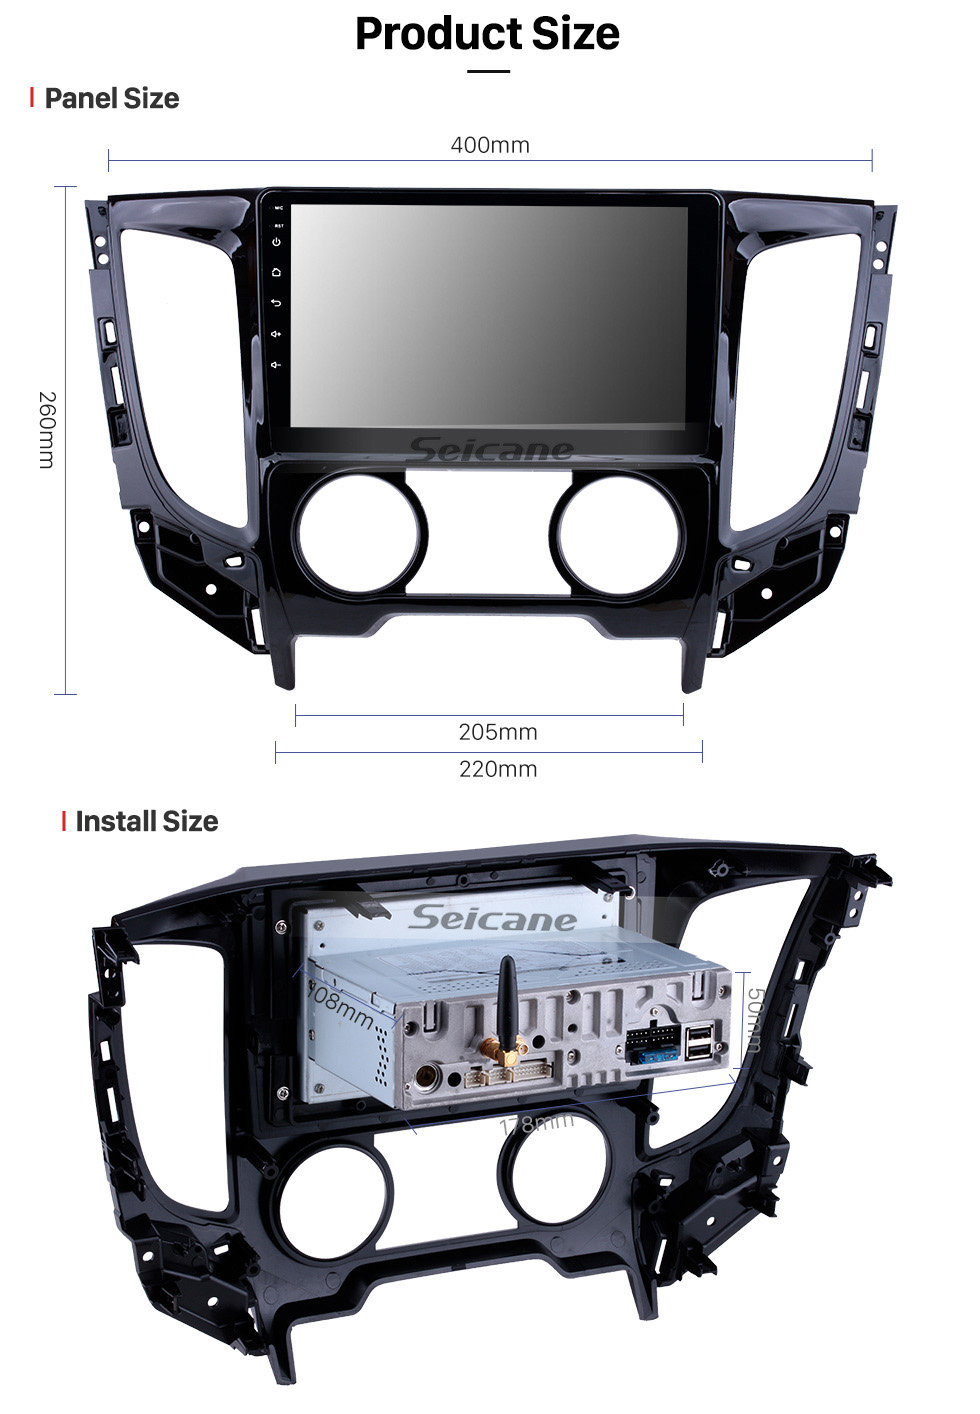 Seicane 9 Zoll Android 9.0 2015 Mitsubishi TRITON Handbuch A / C 1024 * 600 Touchscreen-Radio mit GPS GPS Navi USB FM Bluetooth WIFI Unterstützung RDS Carplay 4G DVD Player